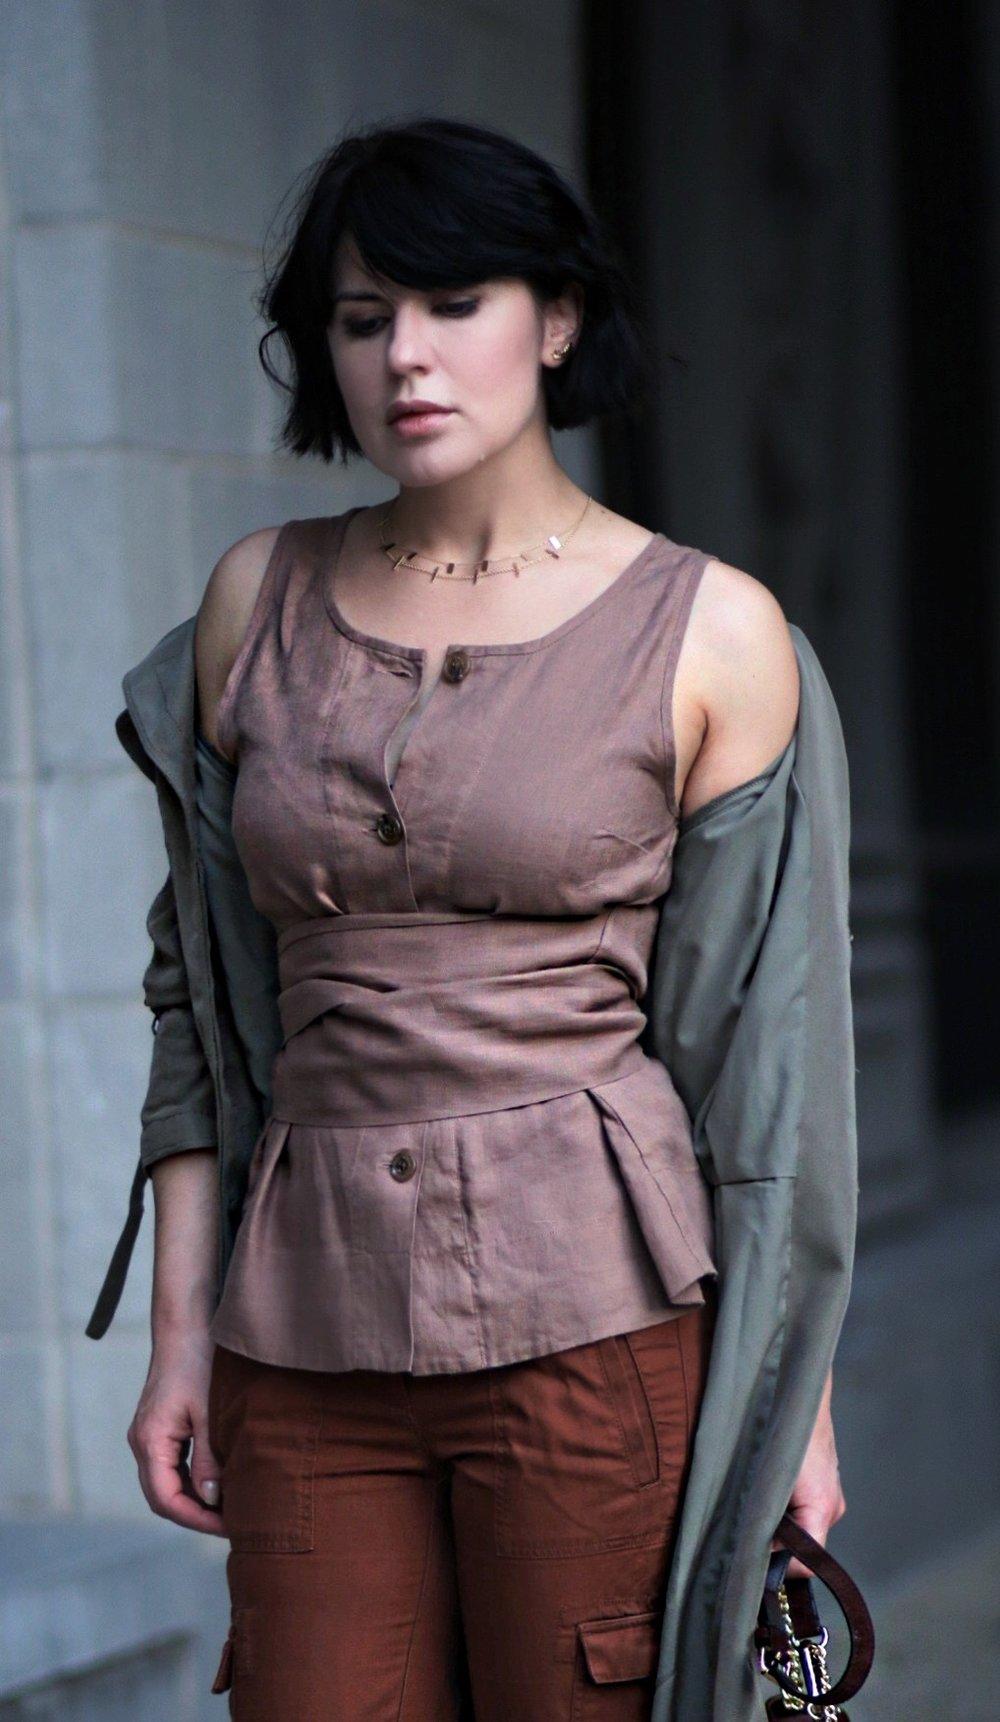 linen-top-arizia-summer-fashion-2017